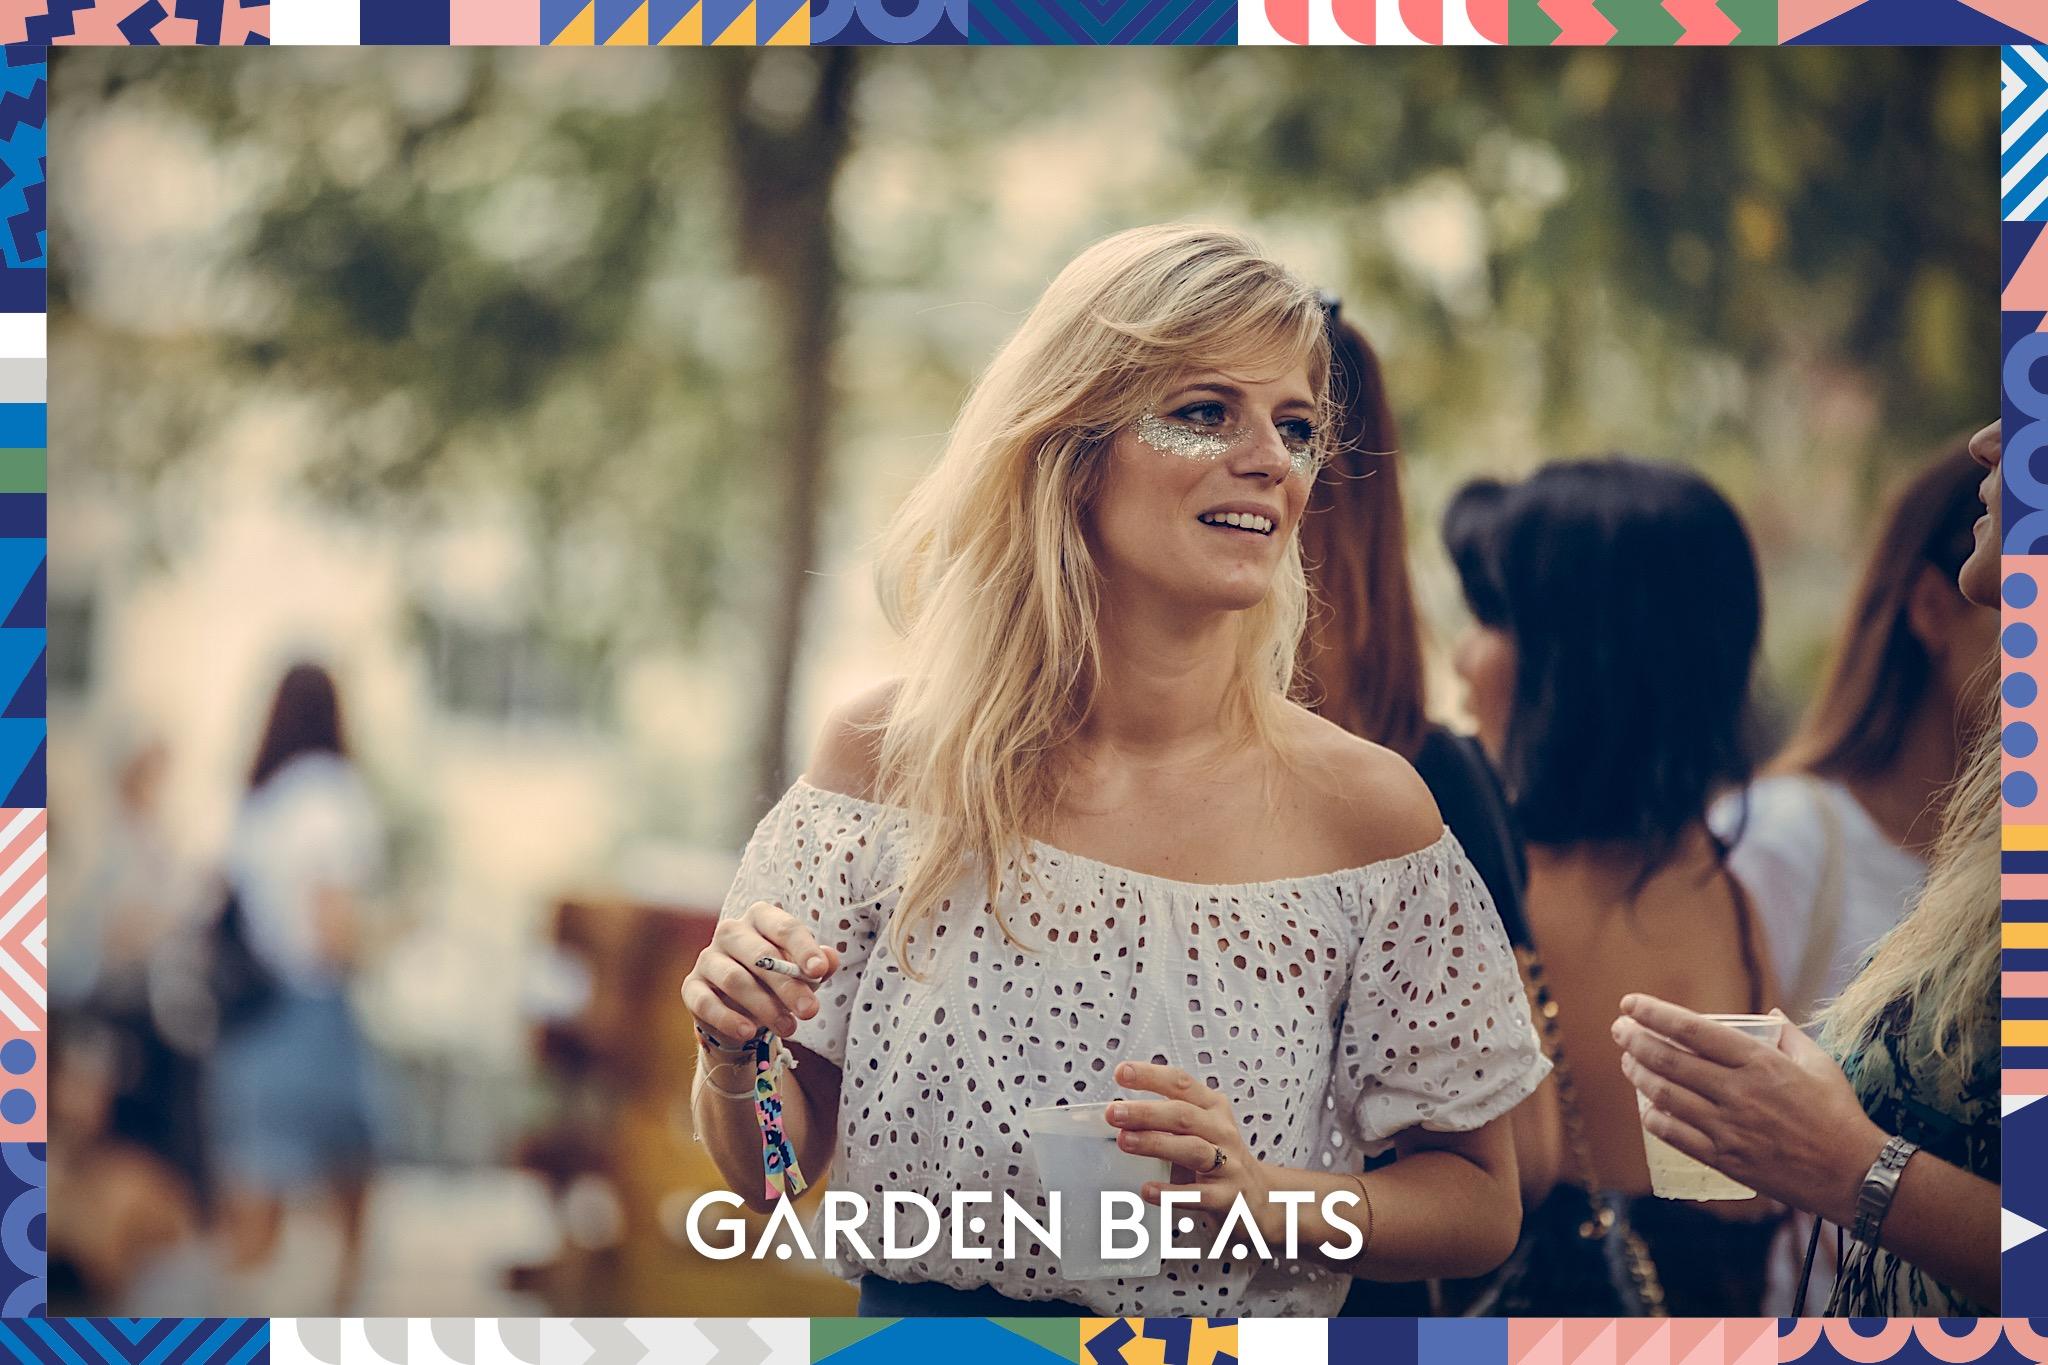 03032018_GardenBeats_Colossal418_Watermarked.jpg